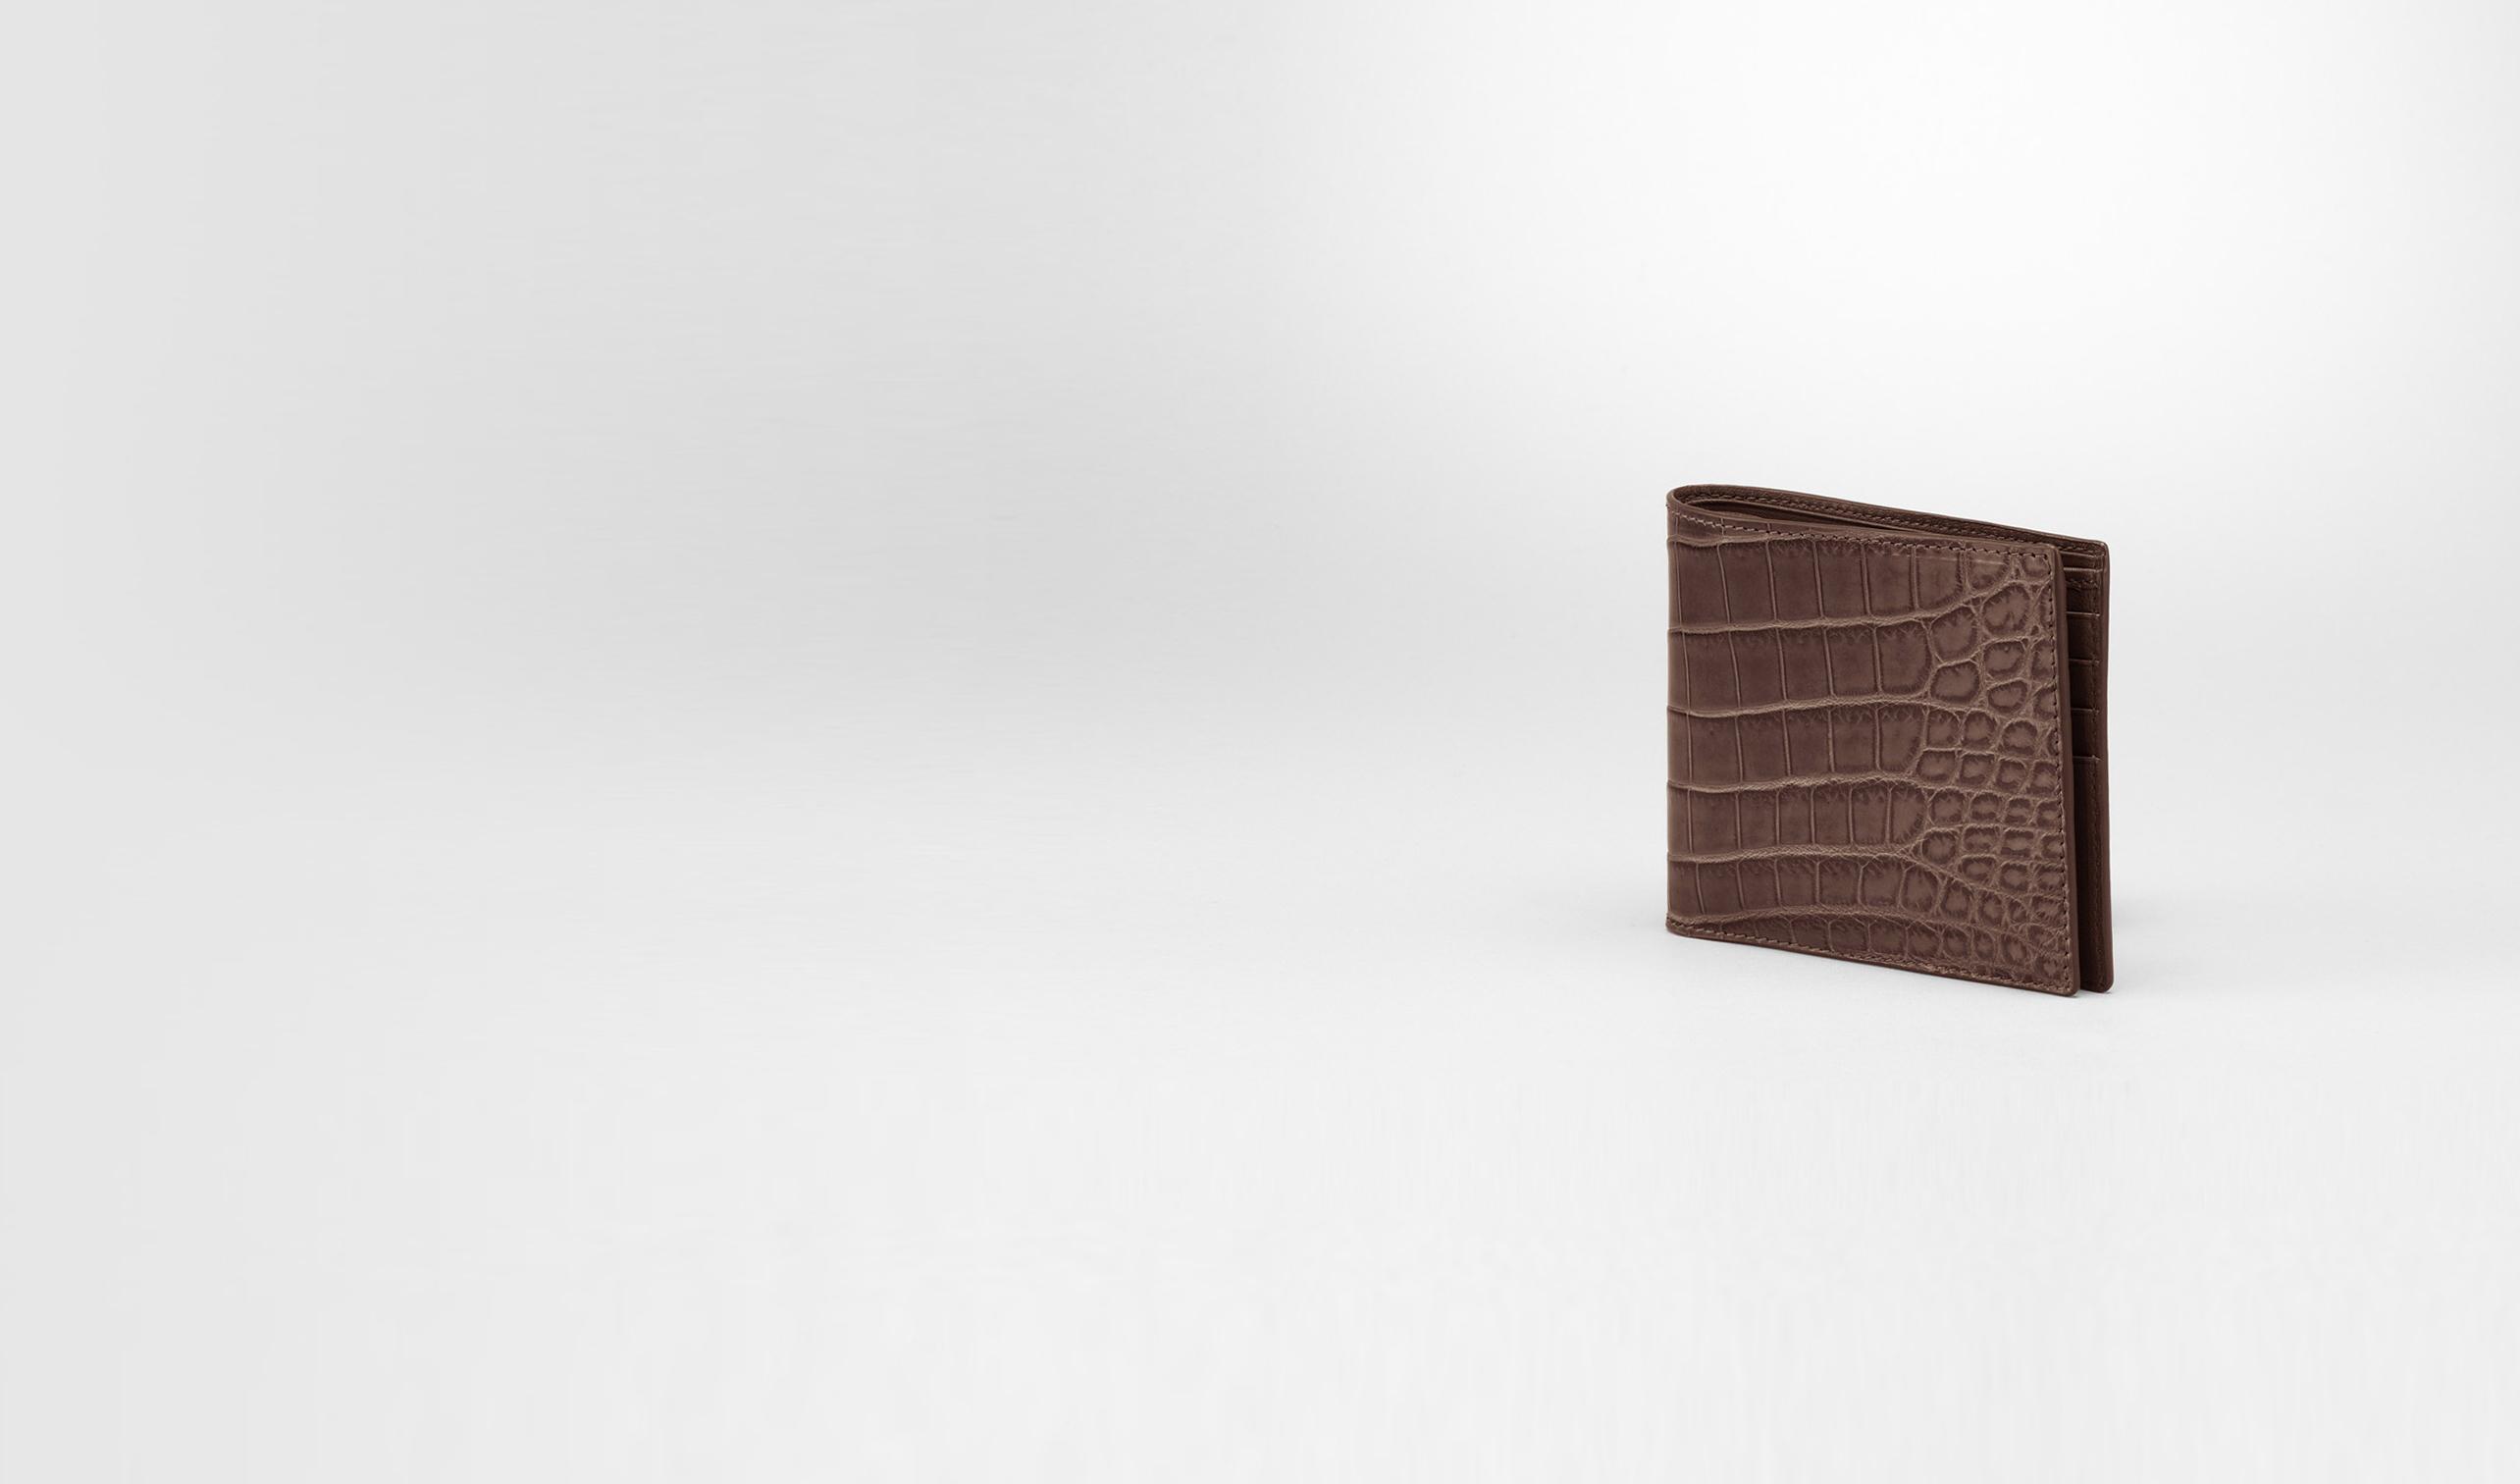 BOTTEGA VENETA Portafoglio bi-fold U PORTAFOGLIO BI-FOLD IN COCCODRILLO EDOARDO pl